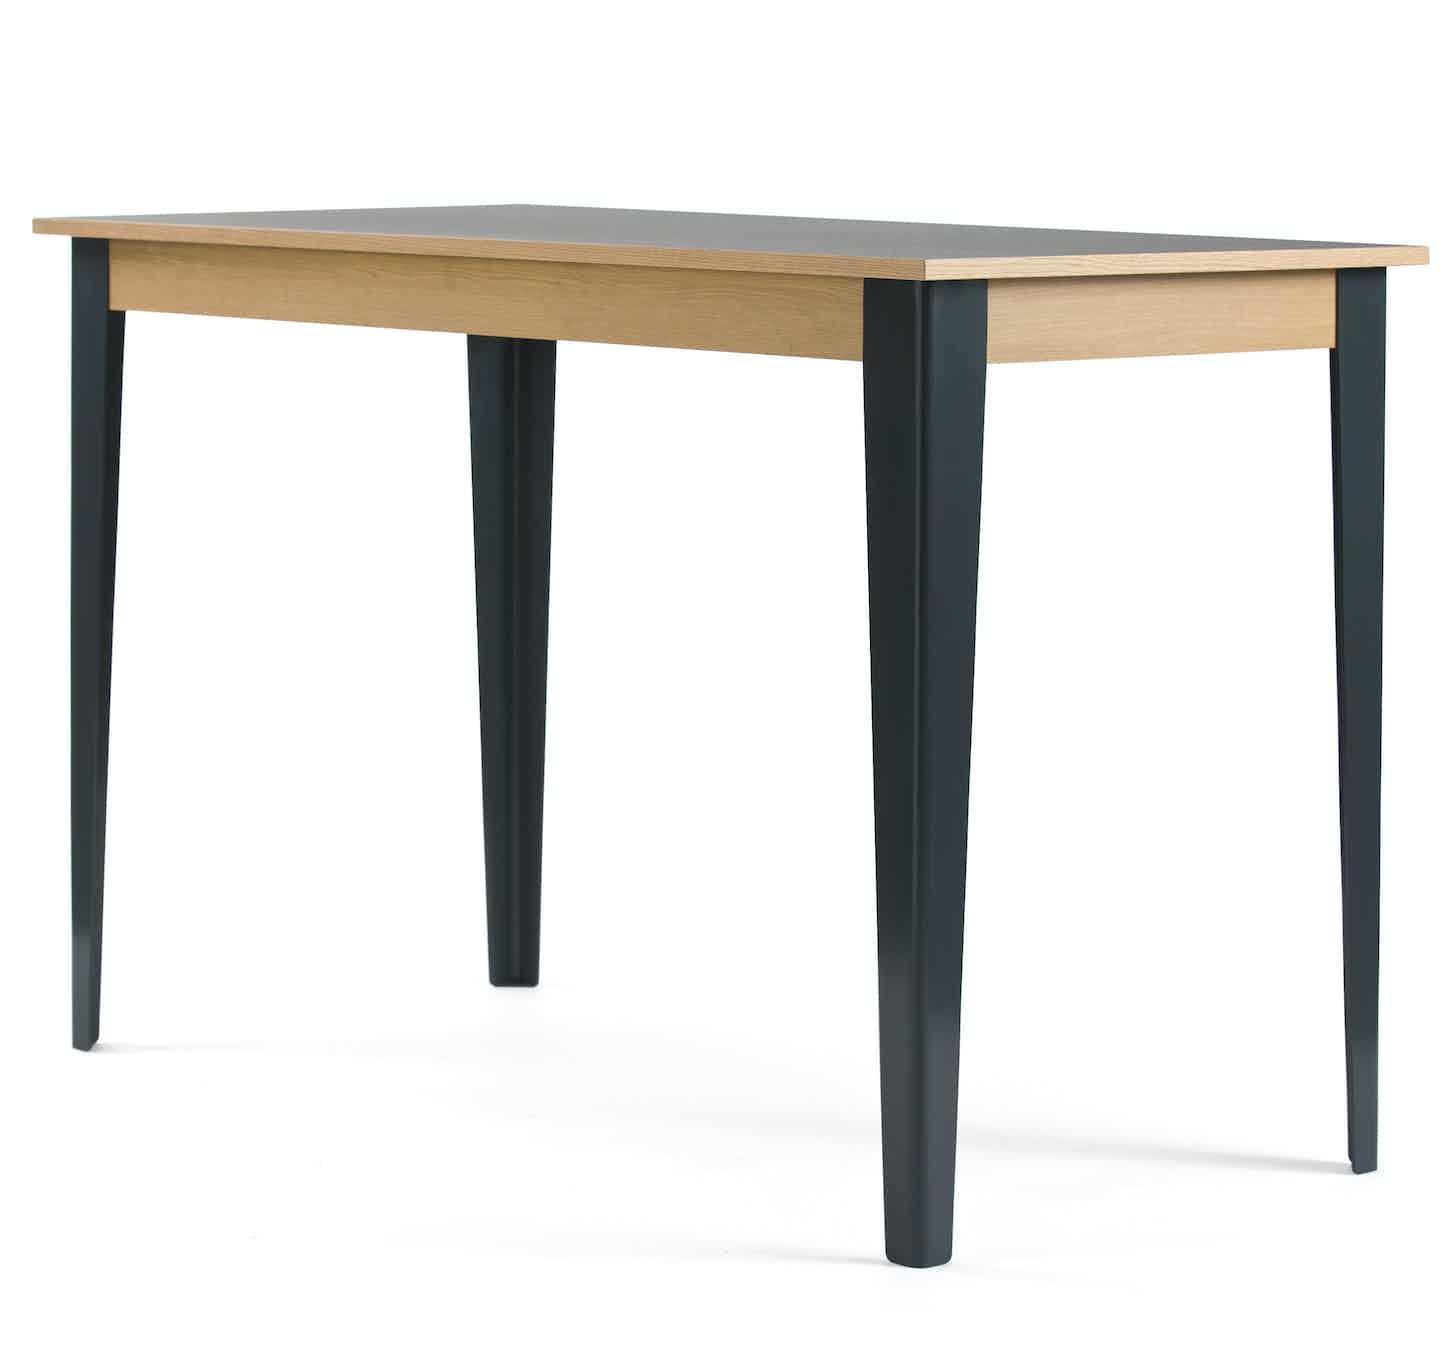 Deadgood-tree-table-tall-angle-haute-living_190225_221132